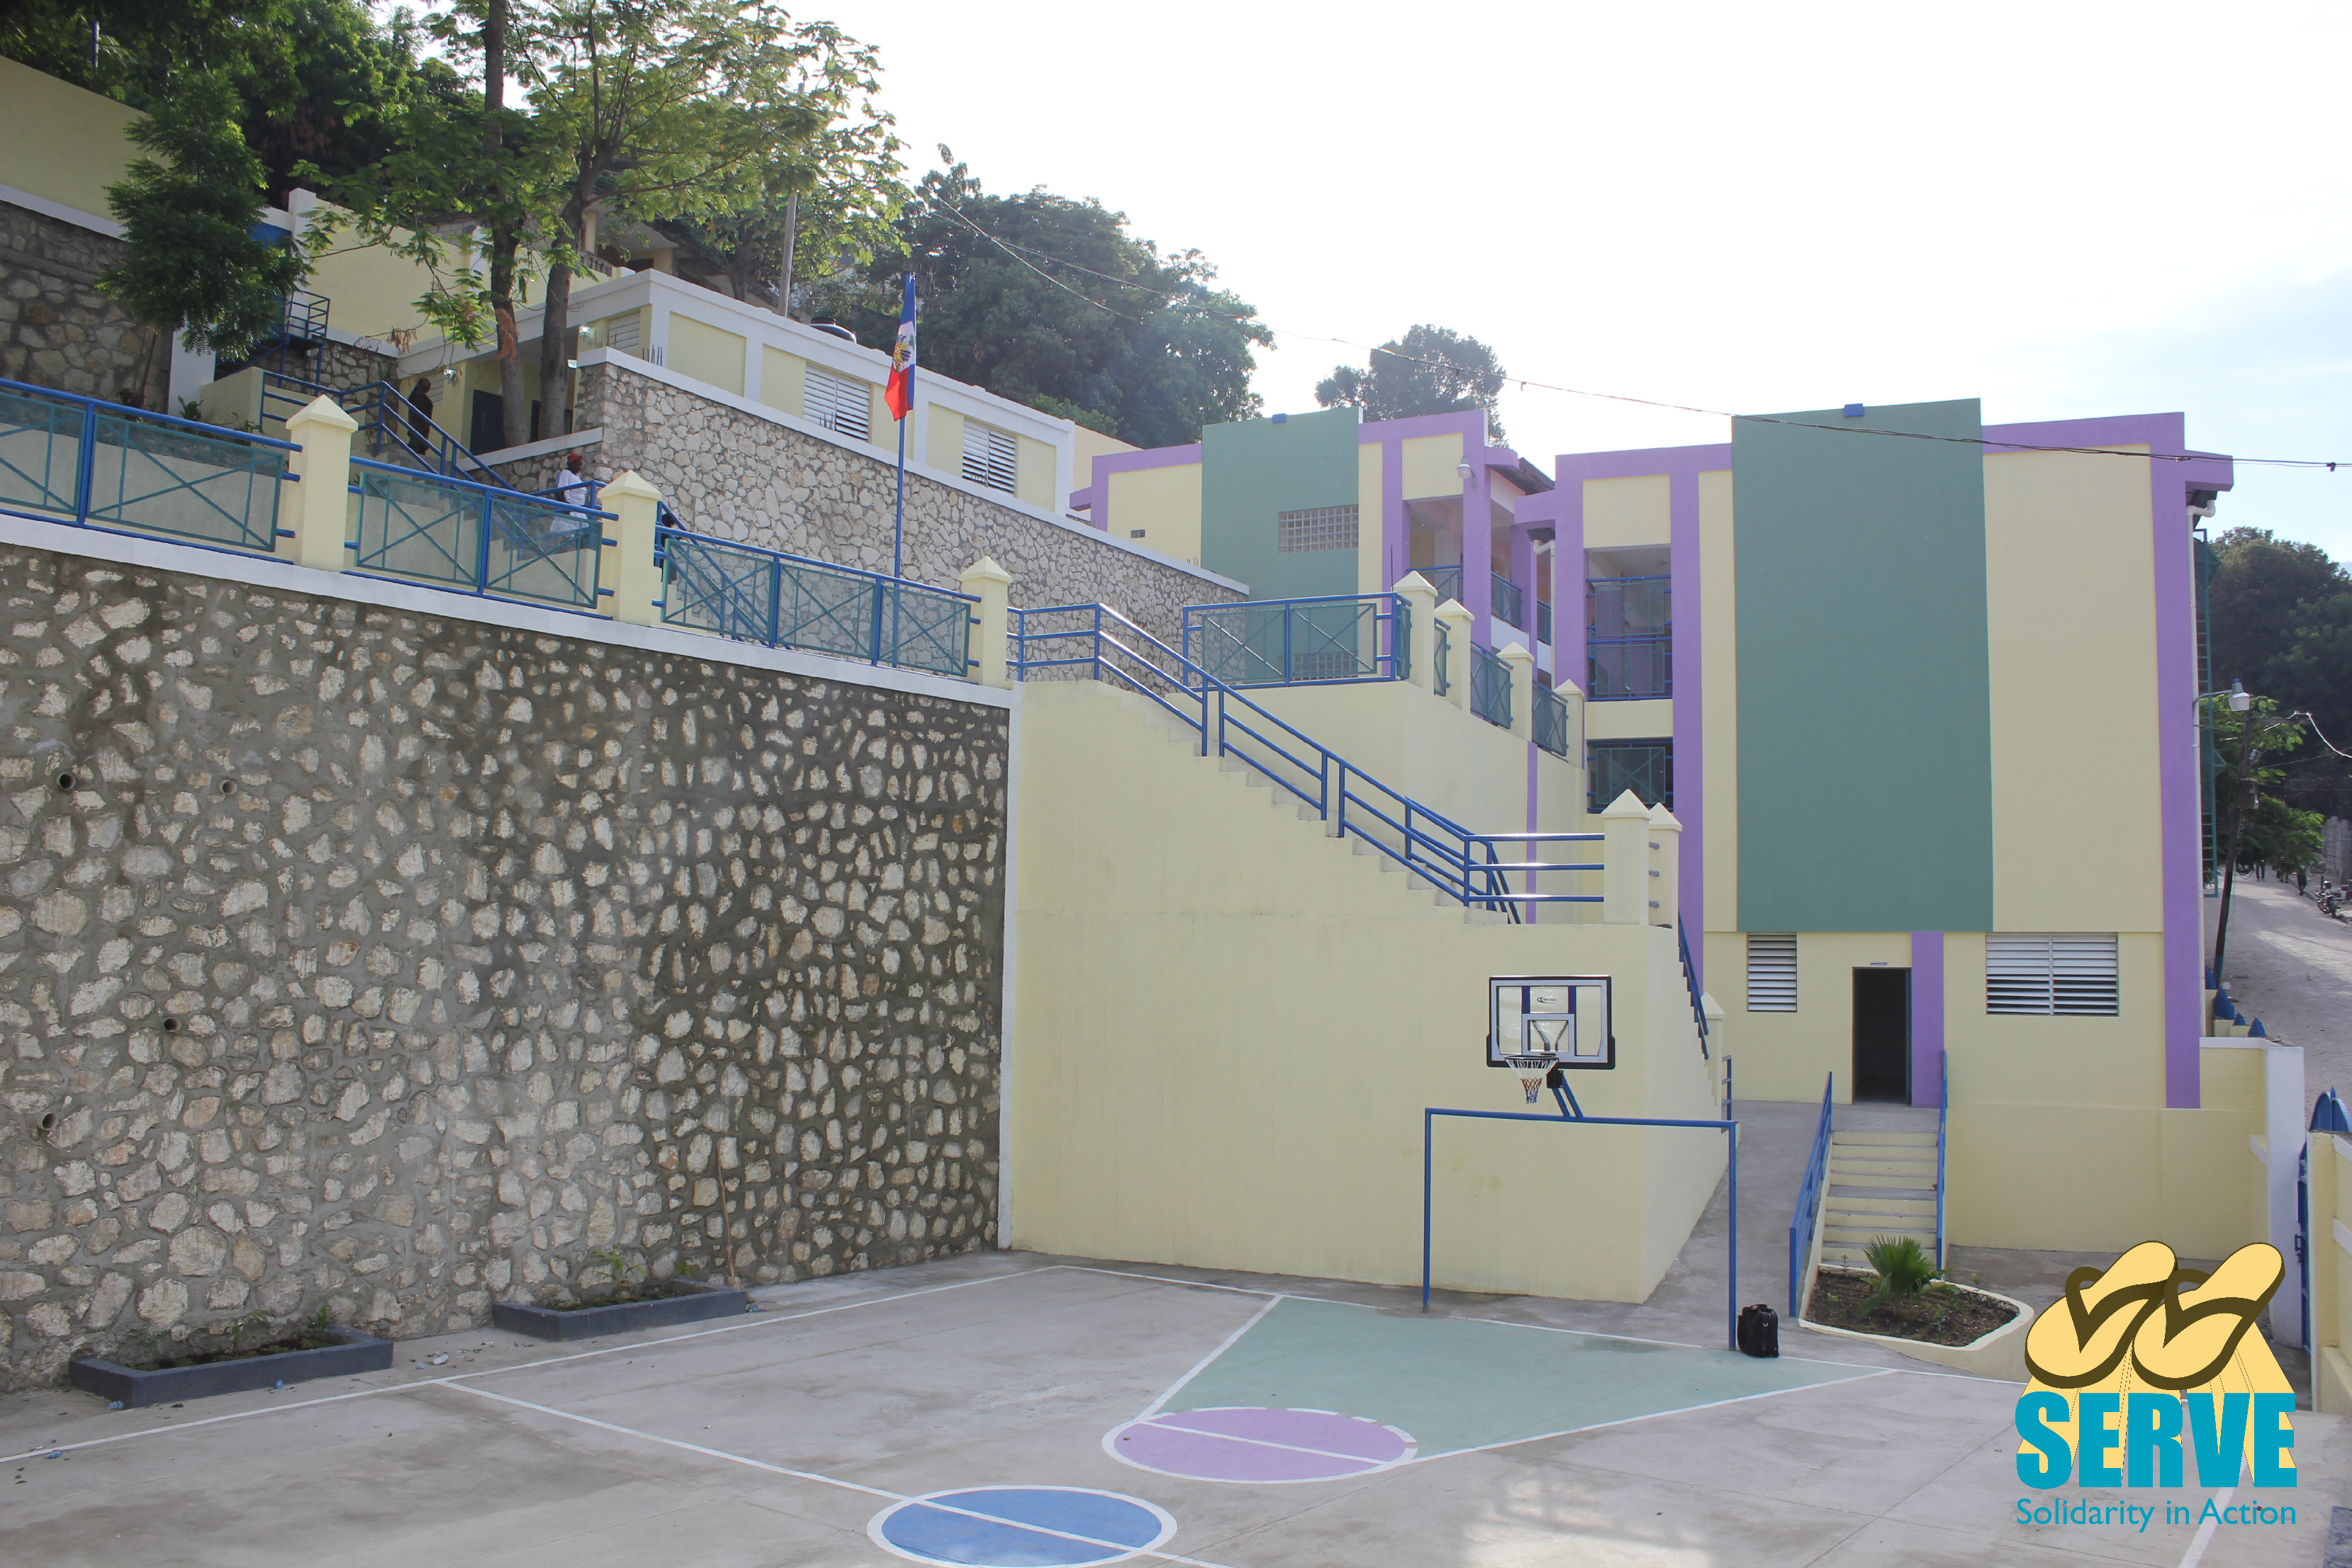 St. Gerard's Primary School